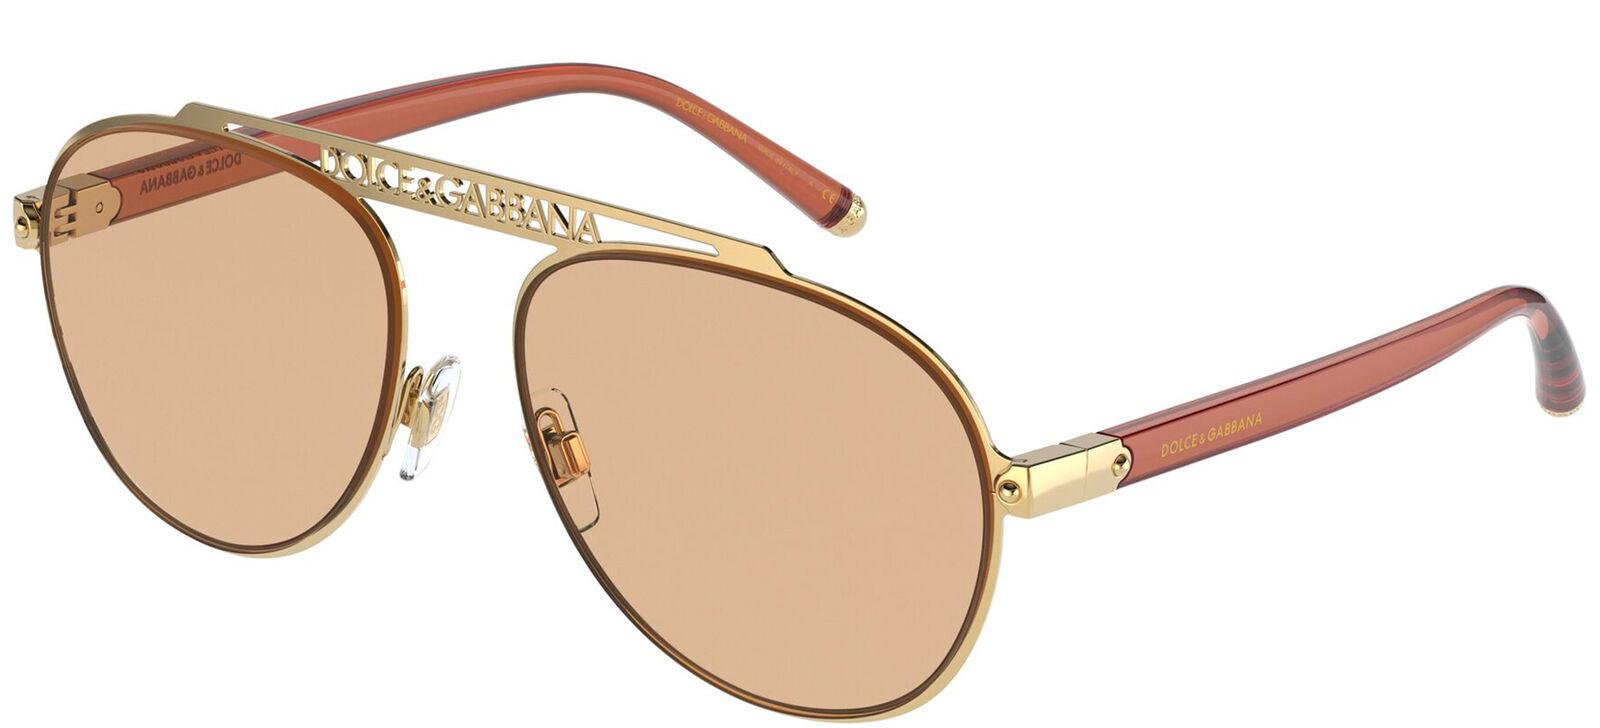 Dolce & Gabbana LOGO DG 2235 Gold/Light Brown 57/16/140 women Sunglasses